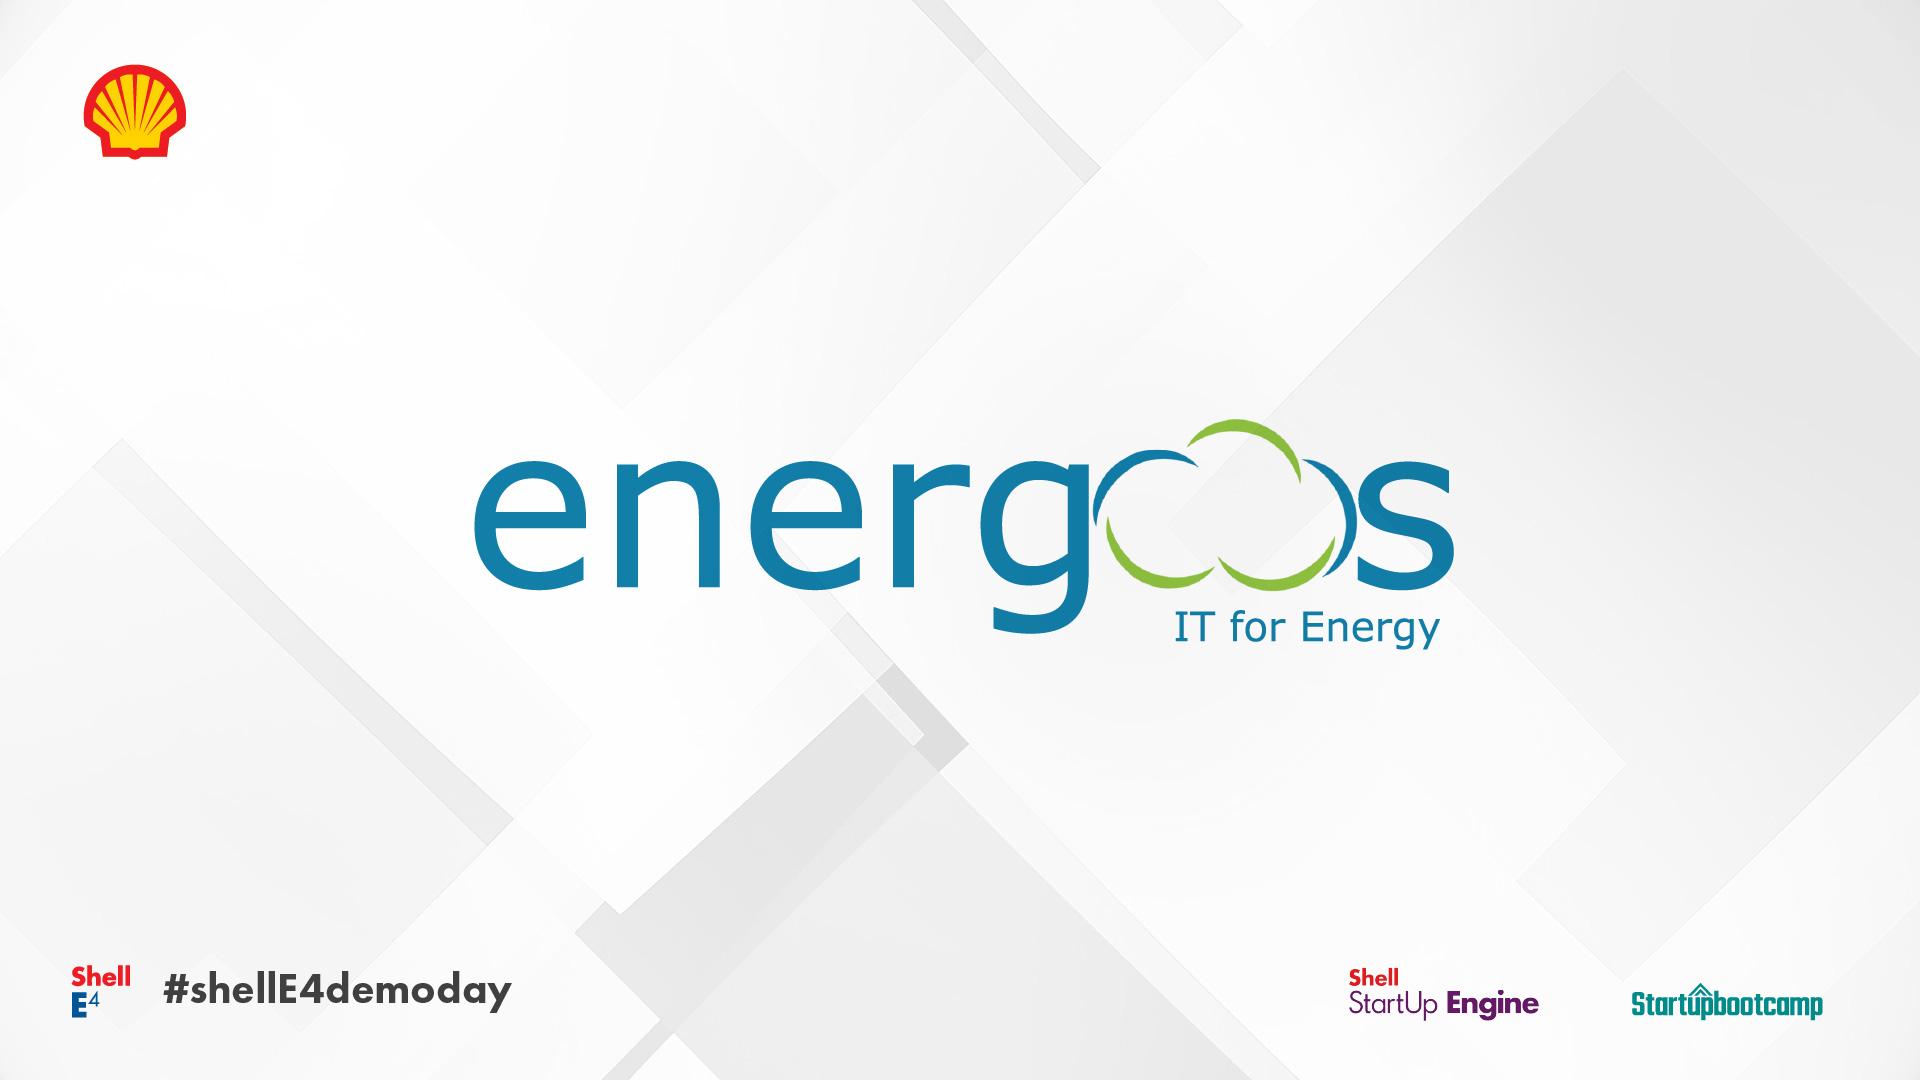 Energos Q&A banner